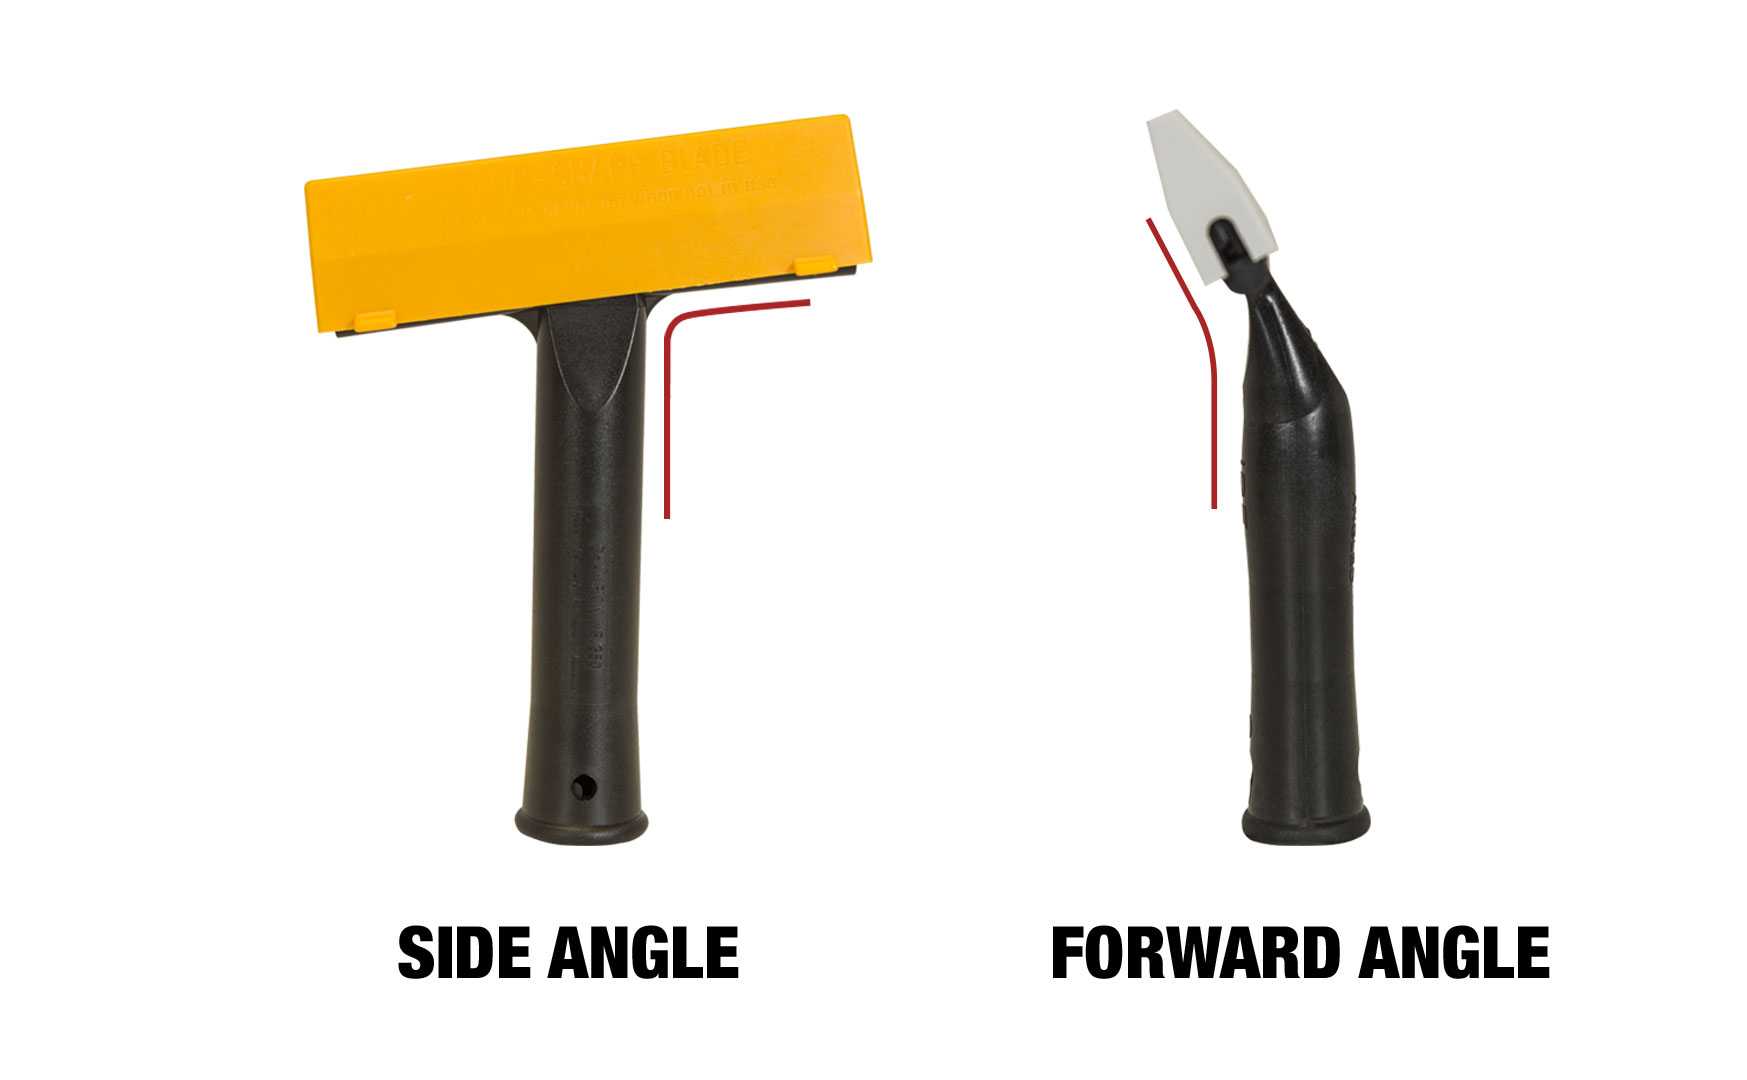 Attributes Of Scrapers: Angle Of Scraper